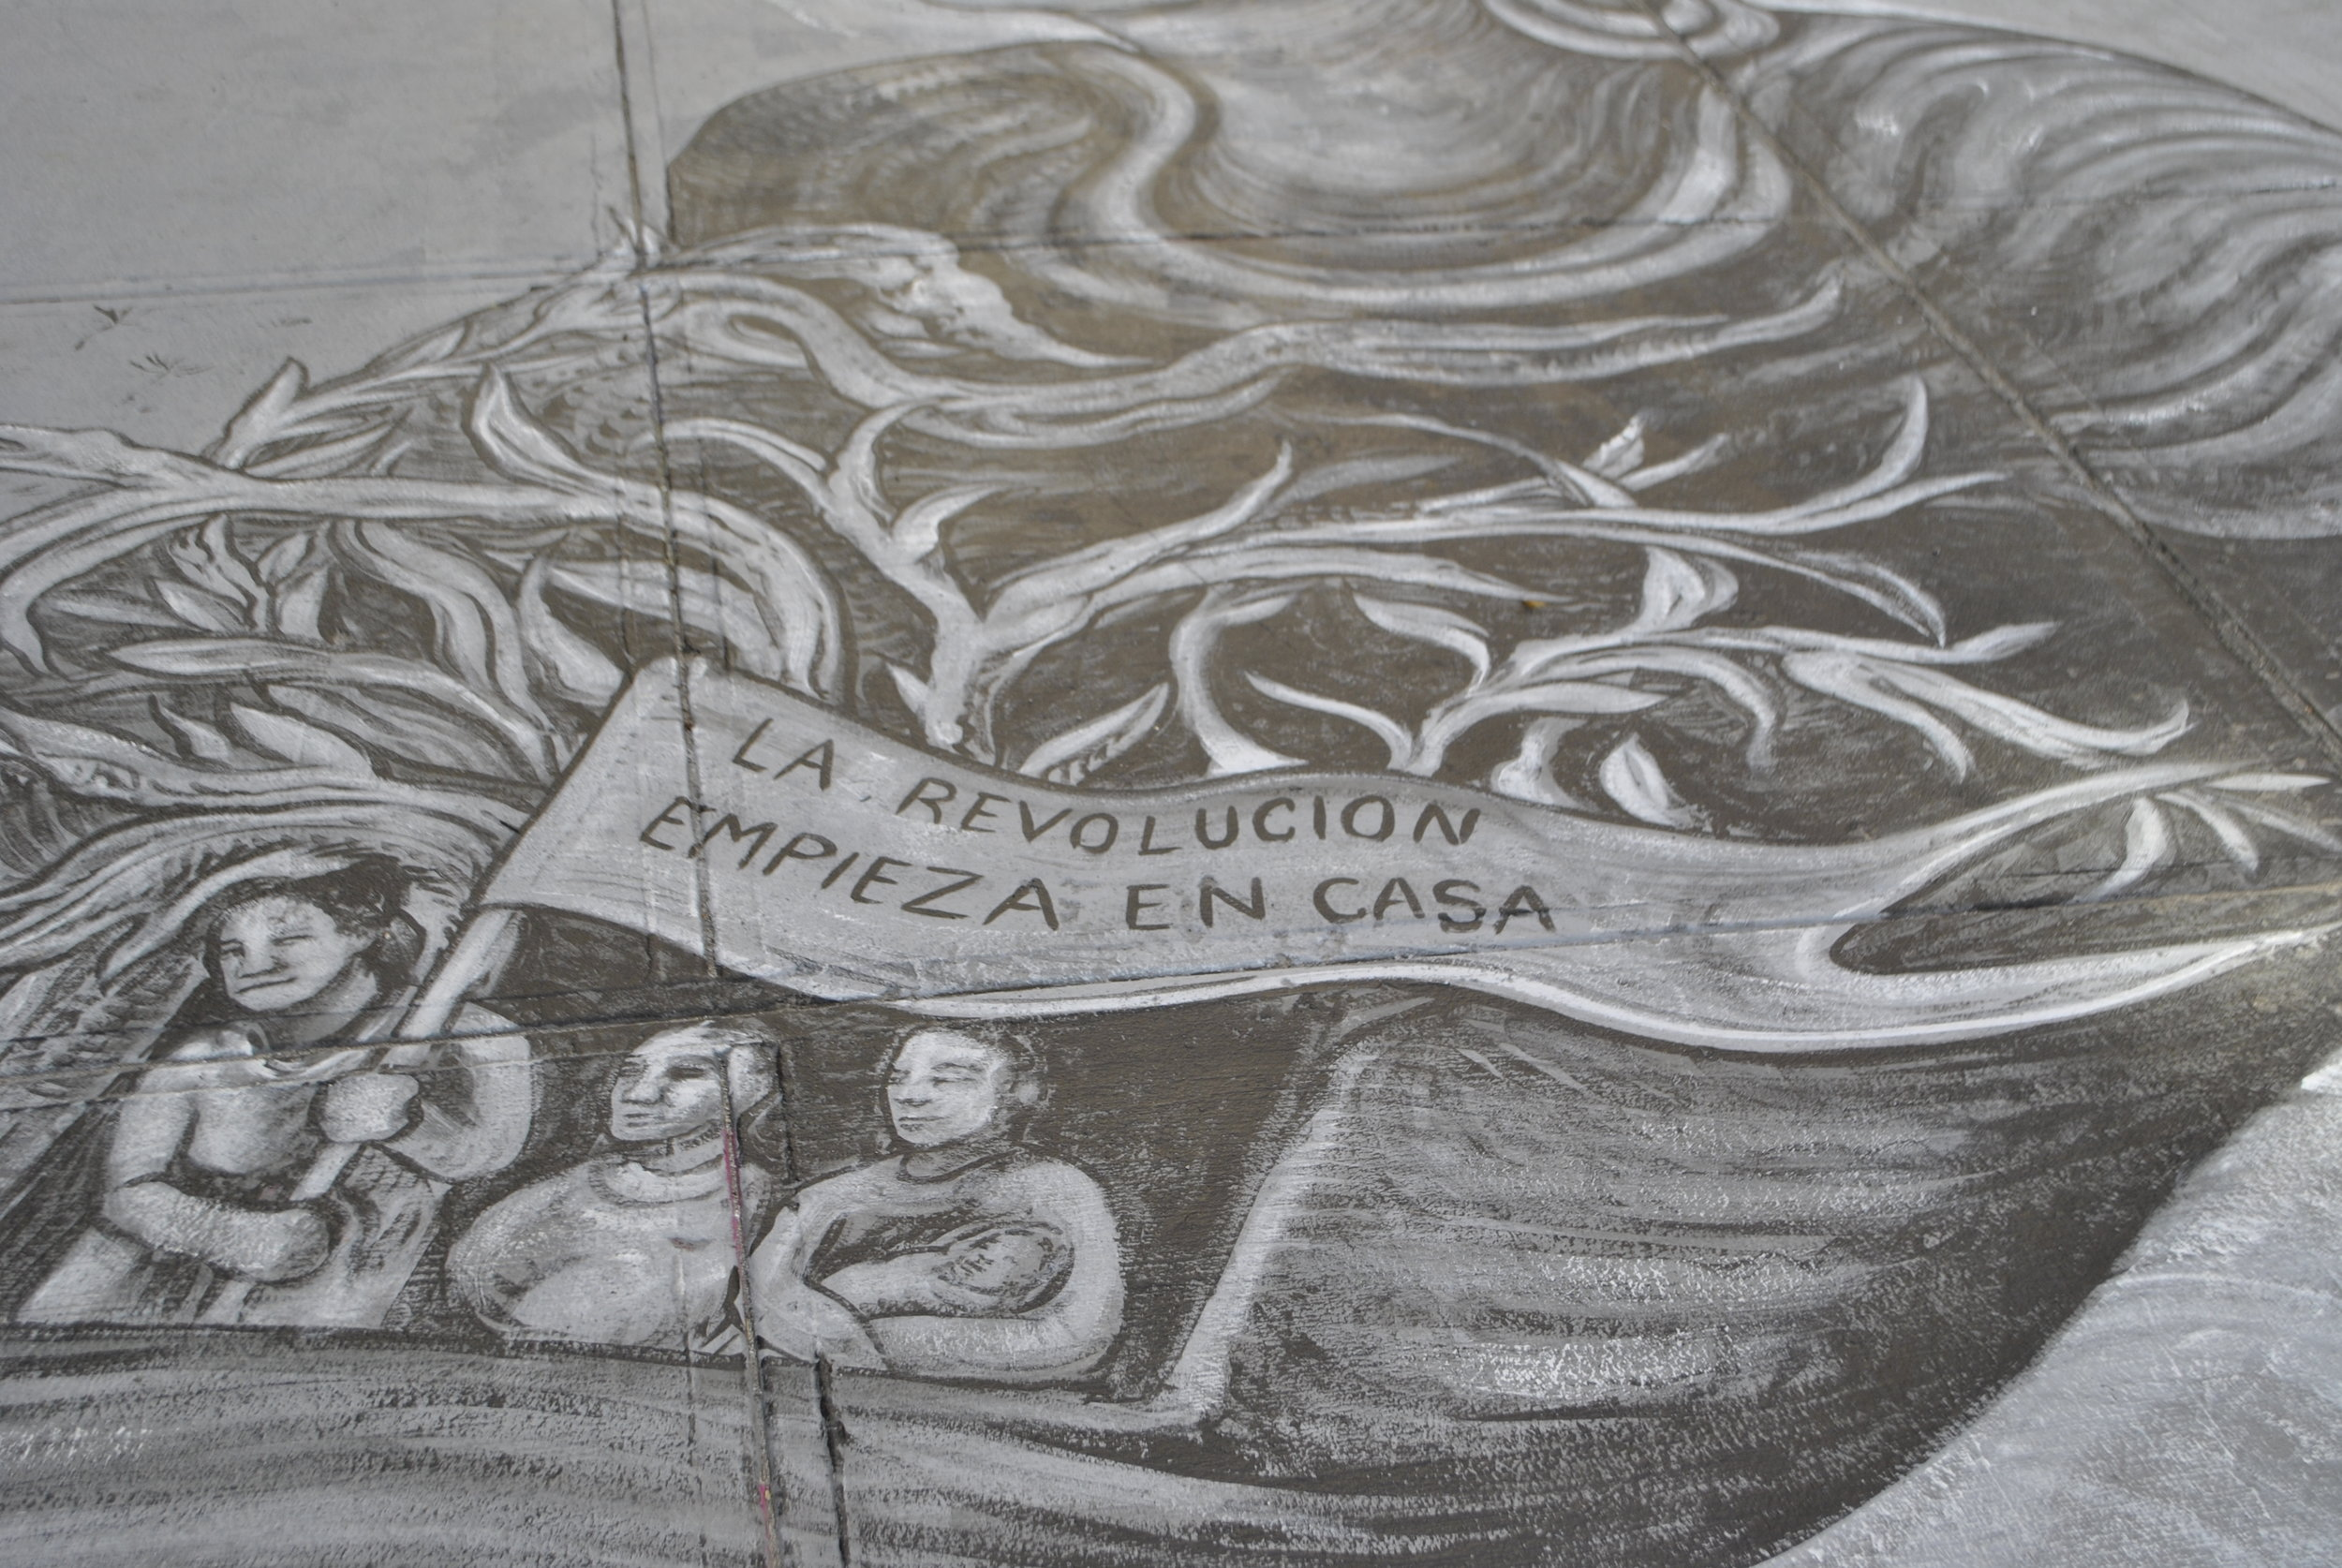 Photo of mural by Raul Ayala and Fernanda Espinosa